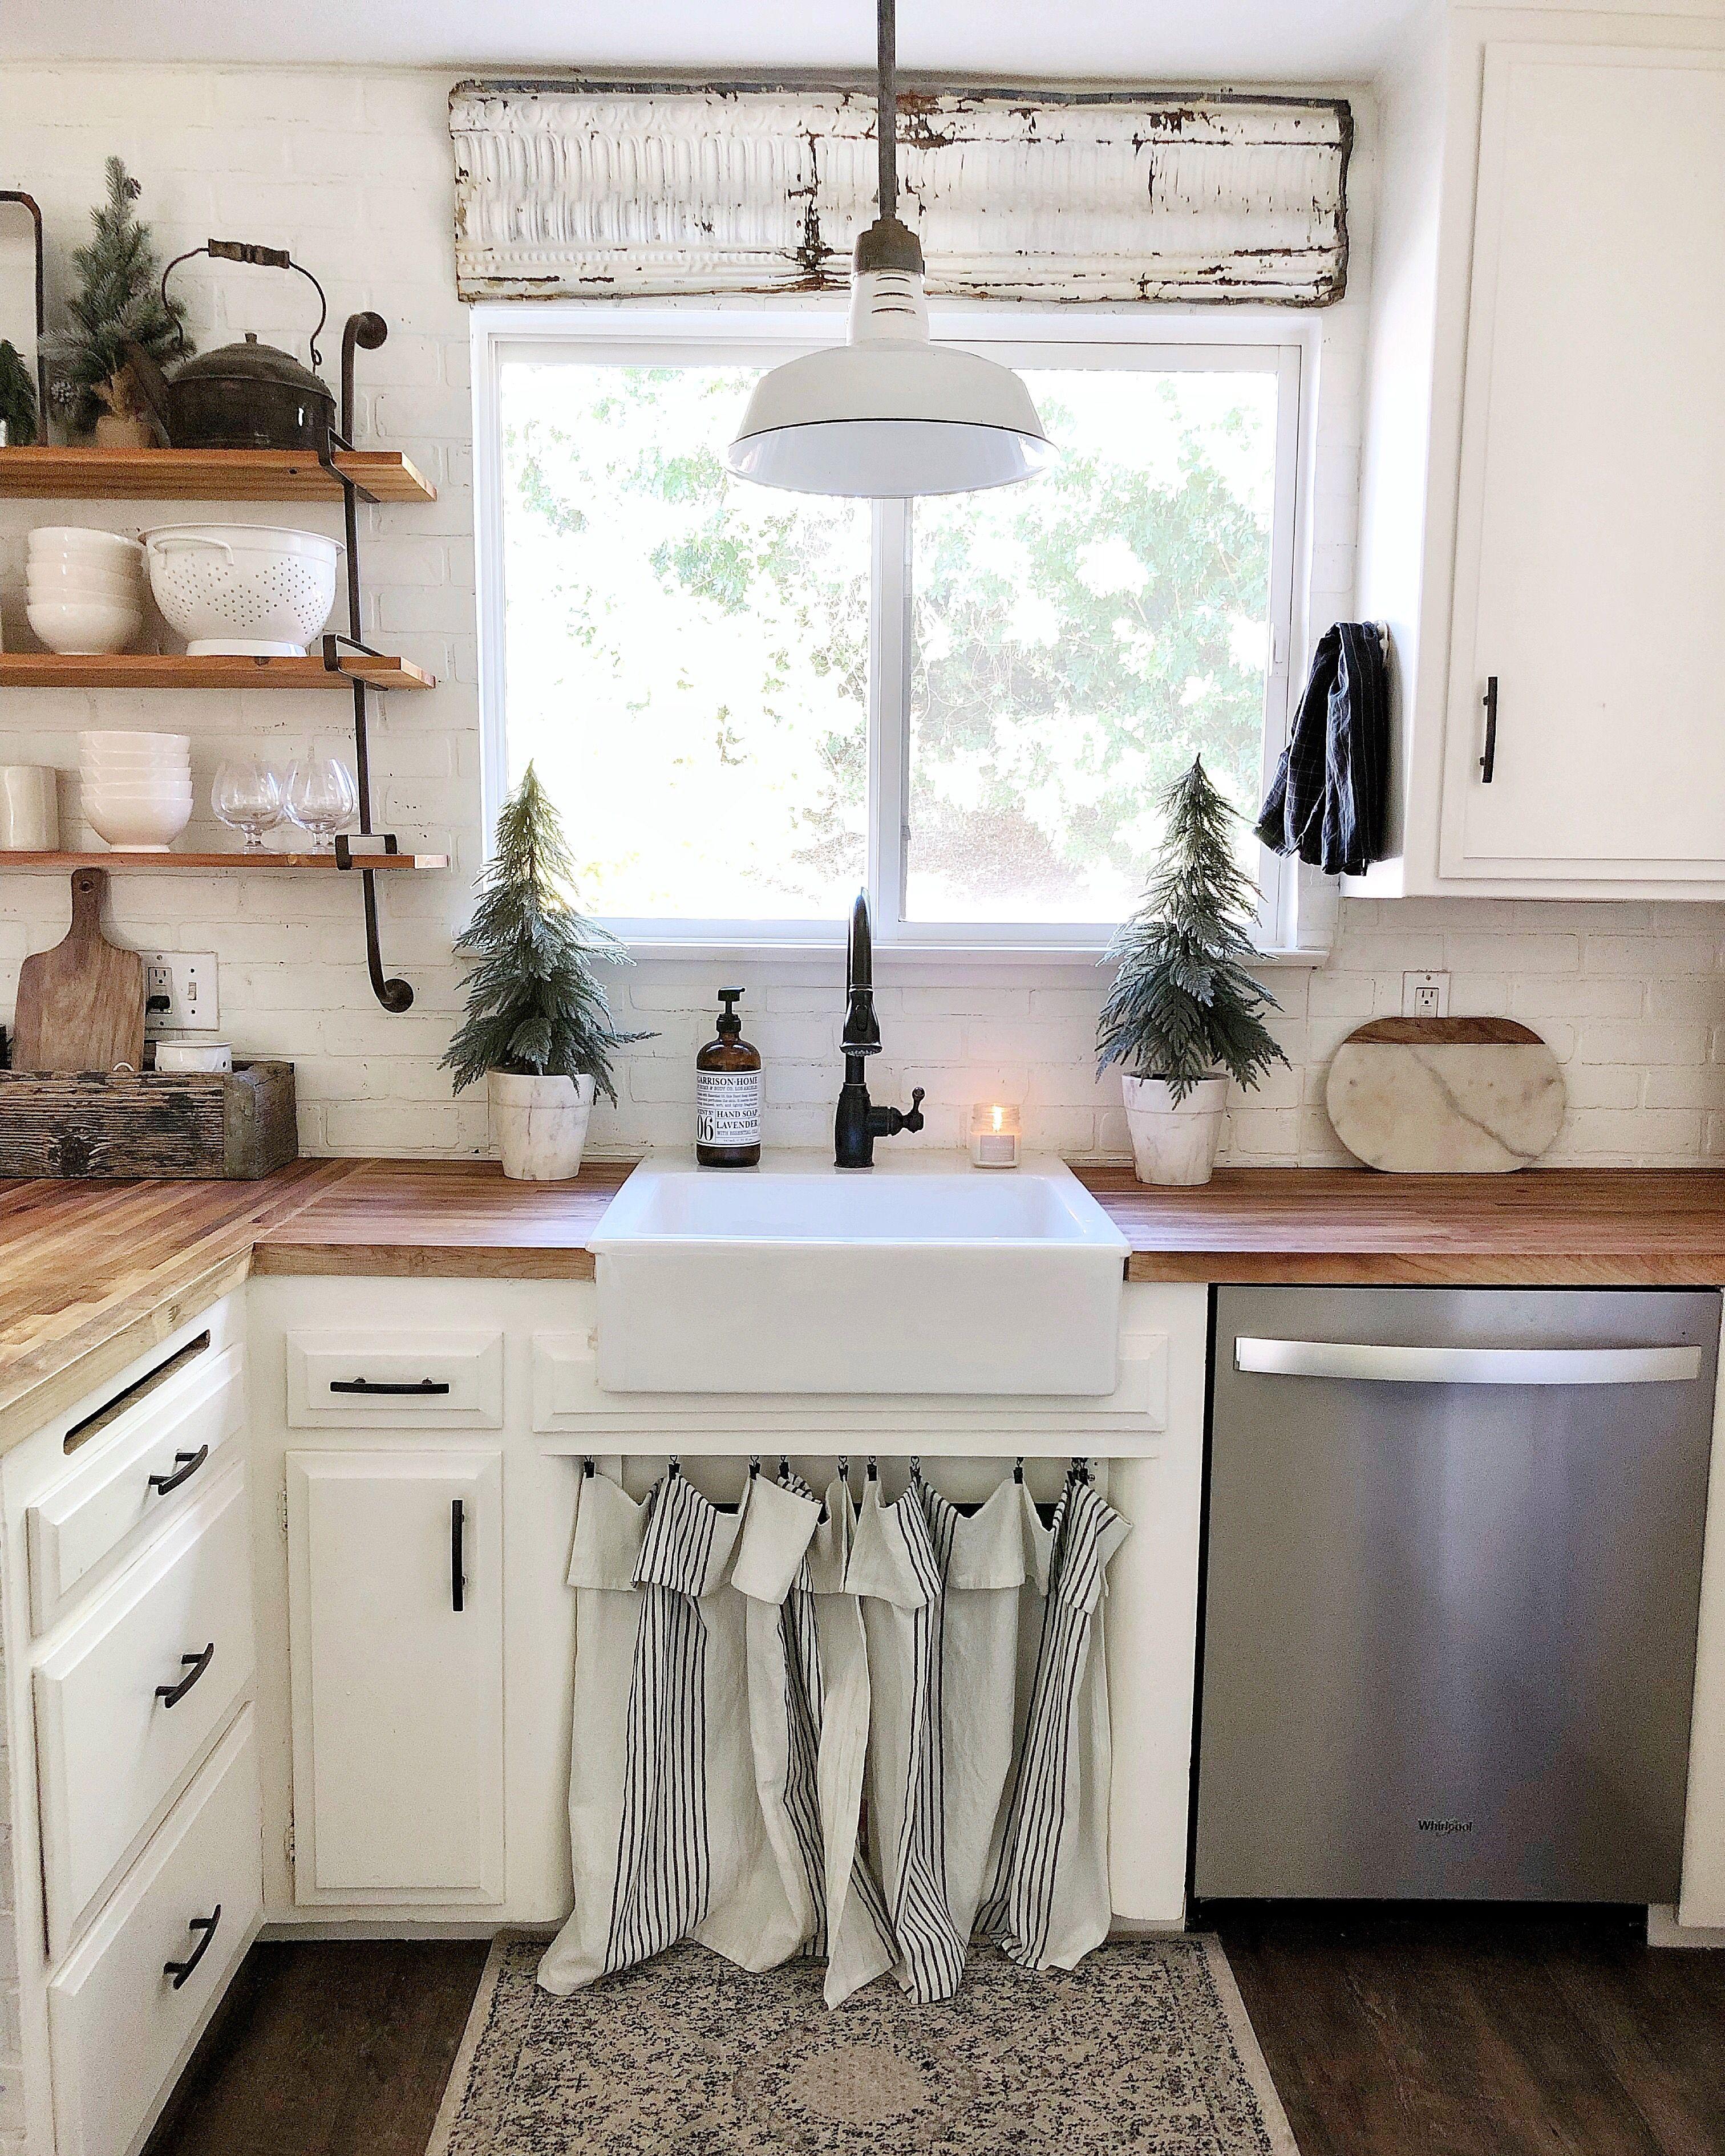 Butcher Block Countertops Farmhouse Sink Farmhouse Style